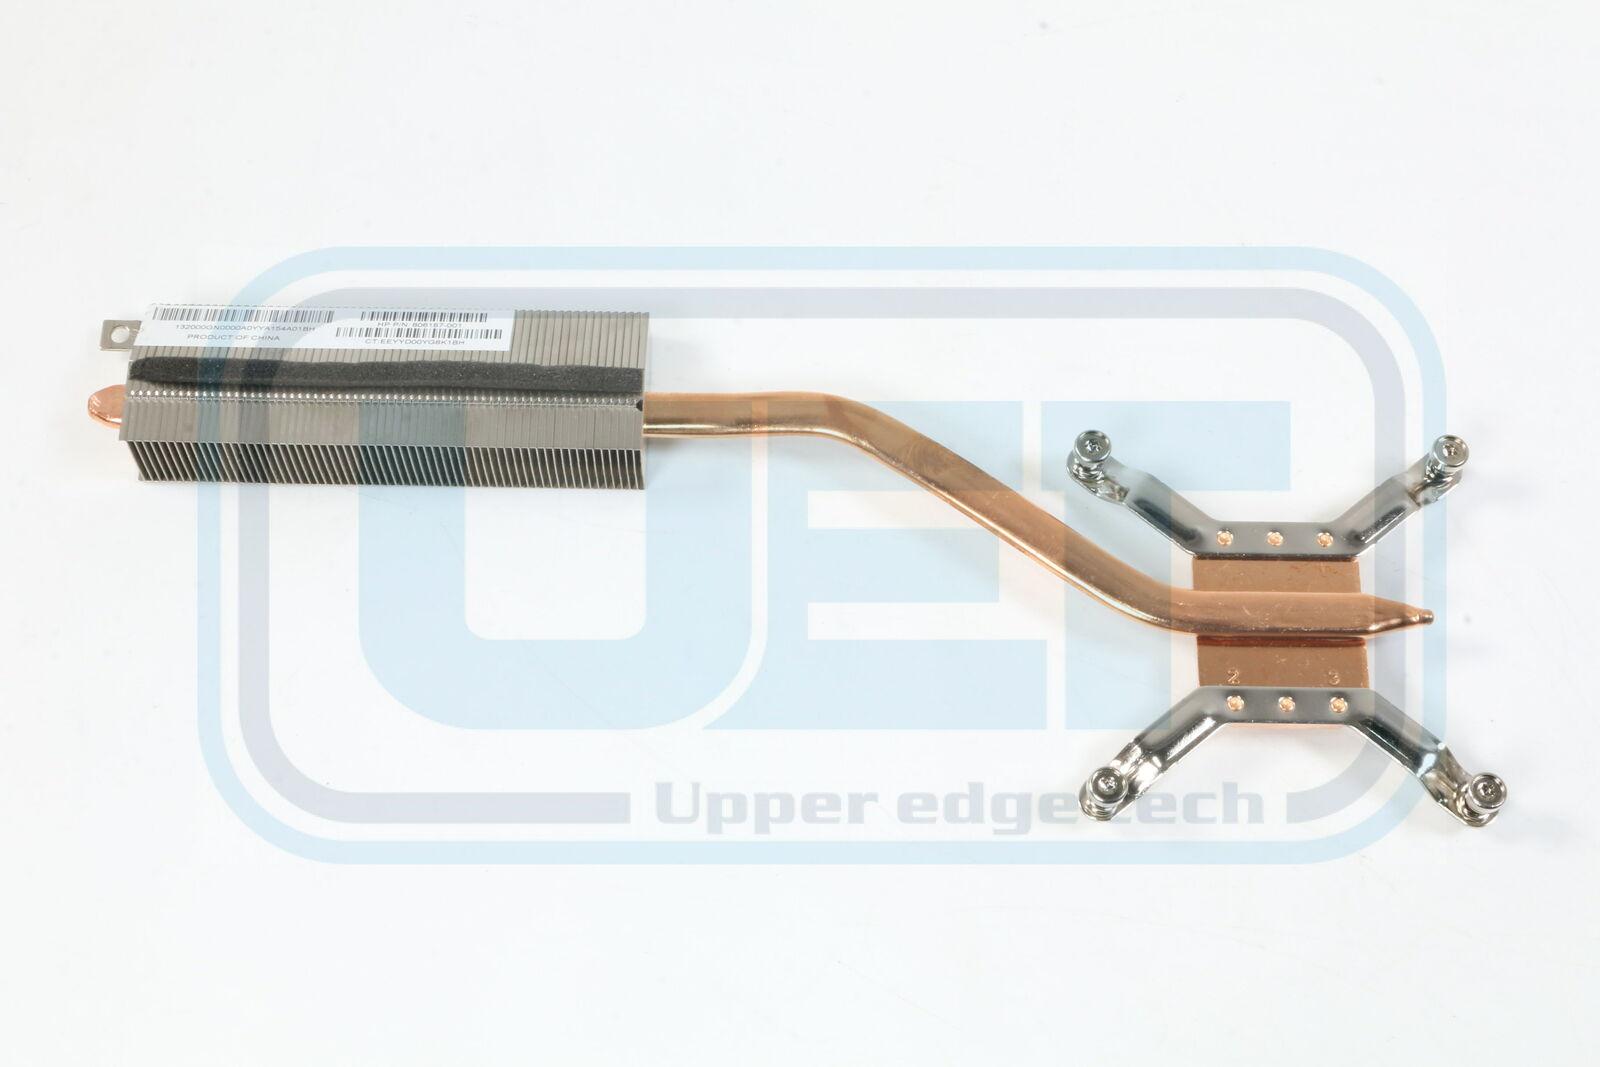 HP 23-R010 CPU Only Heatsink 806187-001 Tested Warranty